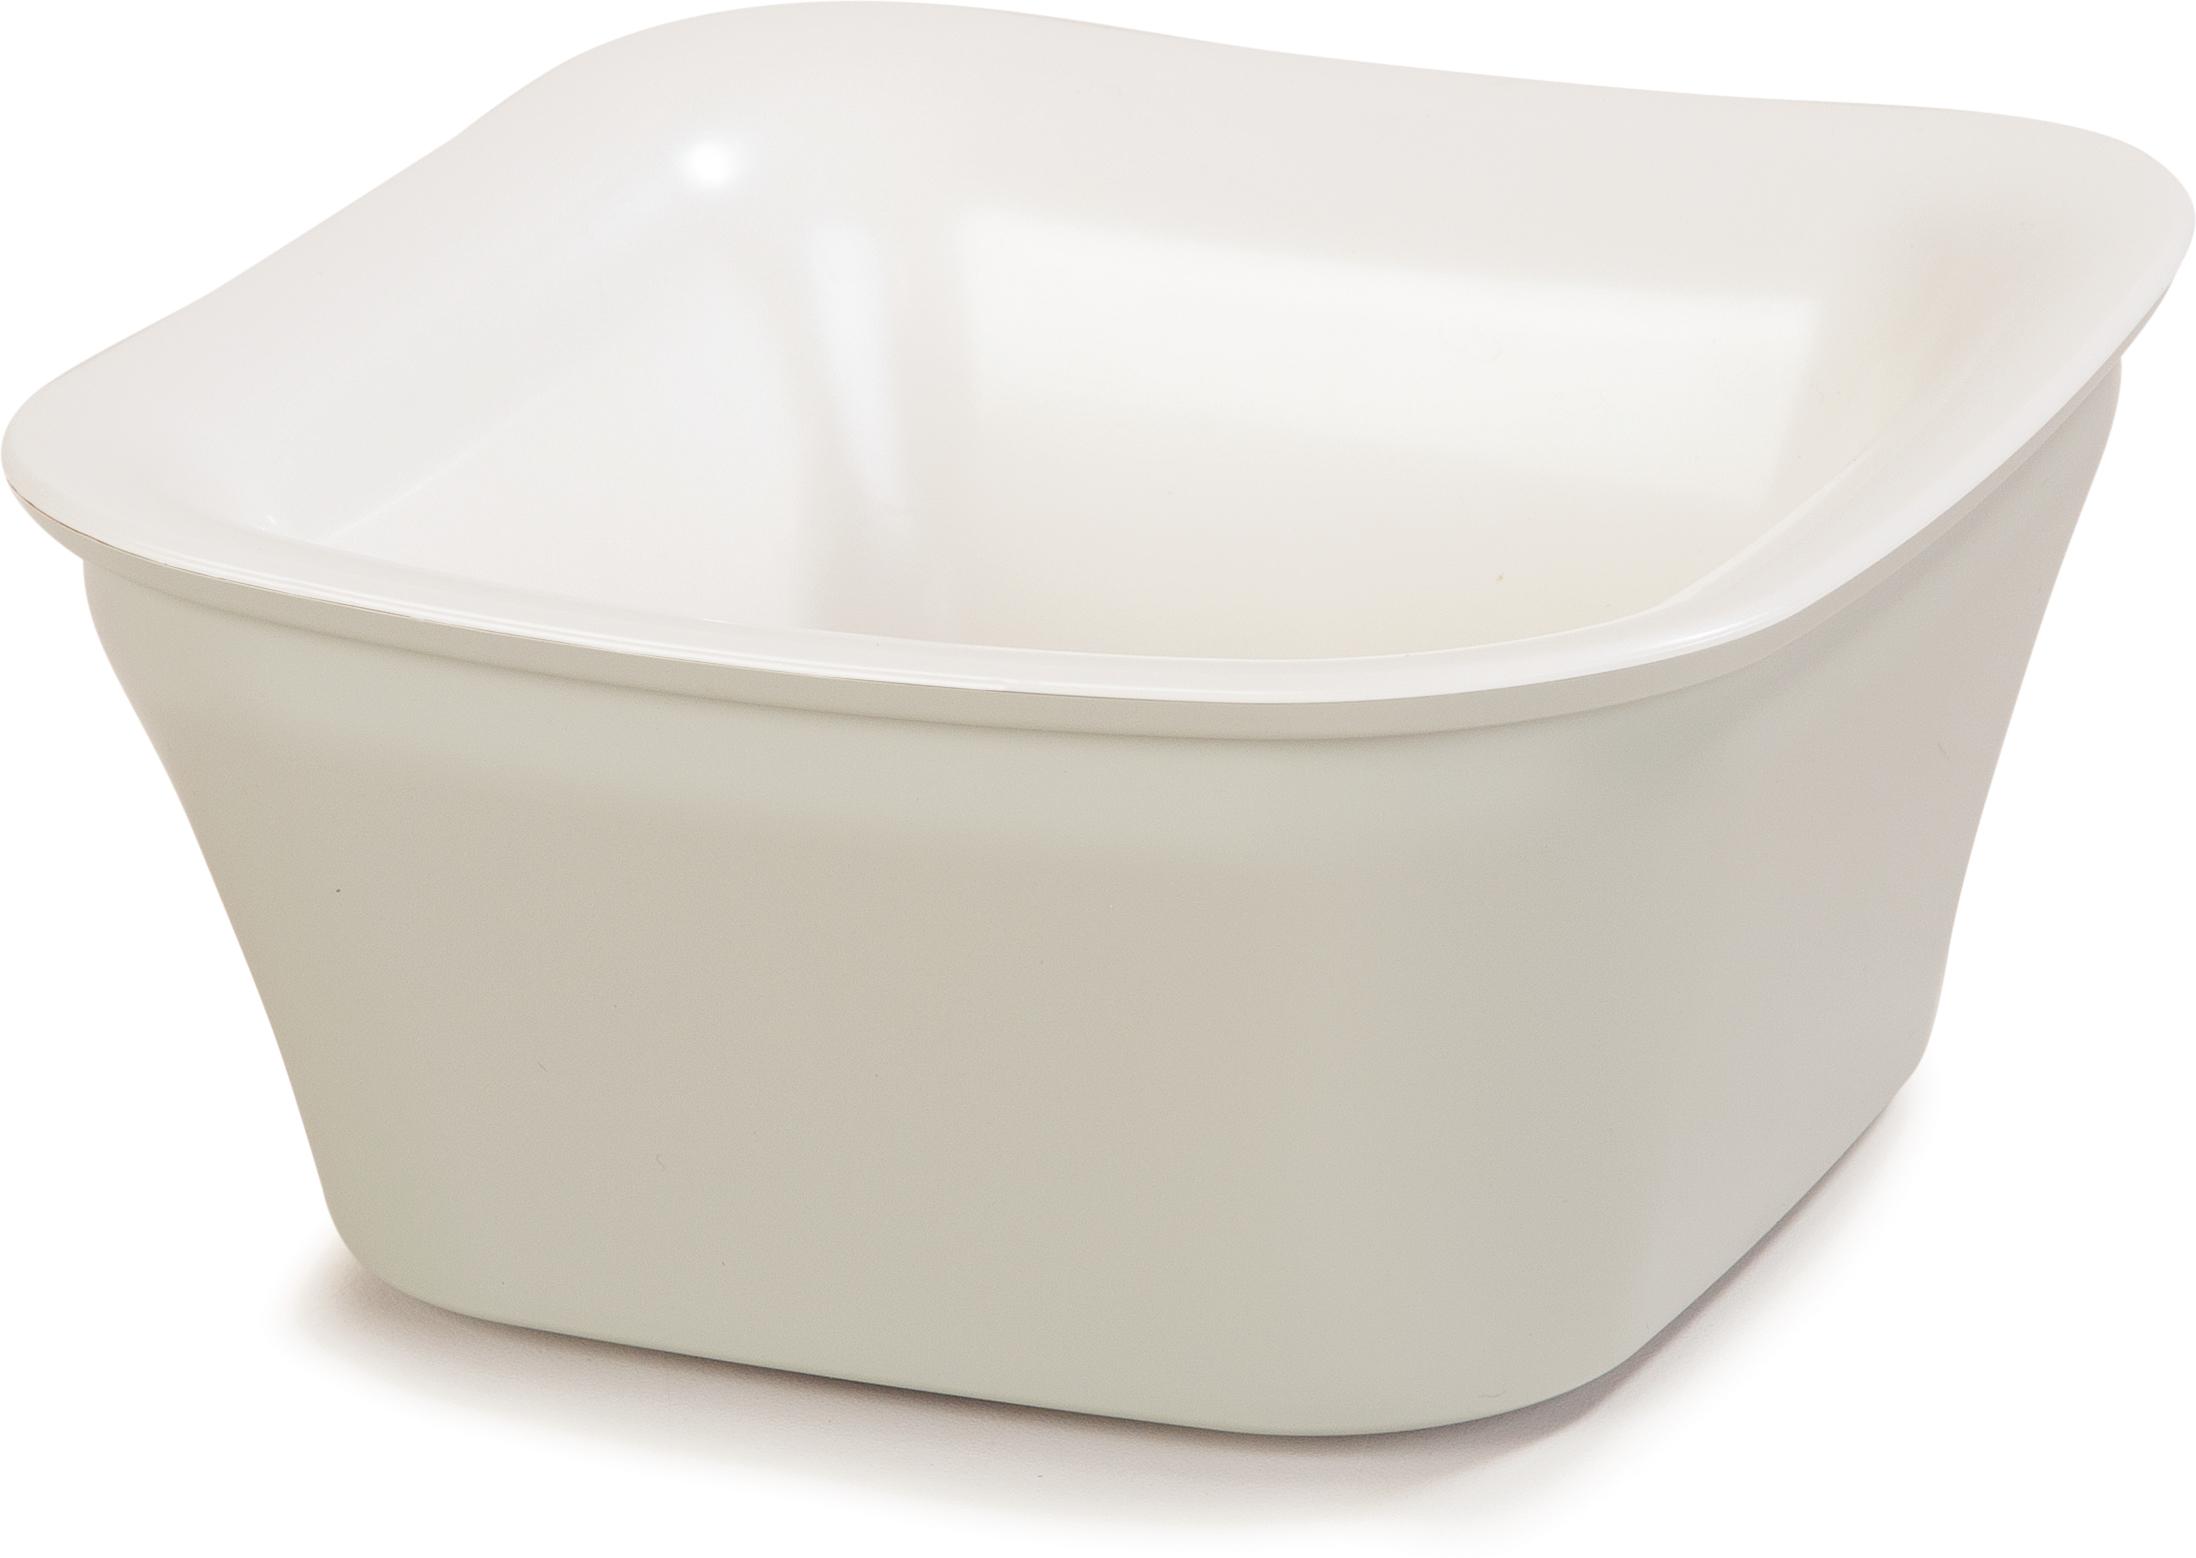 Carlisle CM1400440 foh coldmaster bowls